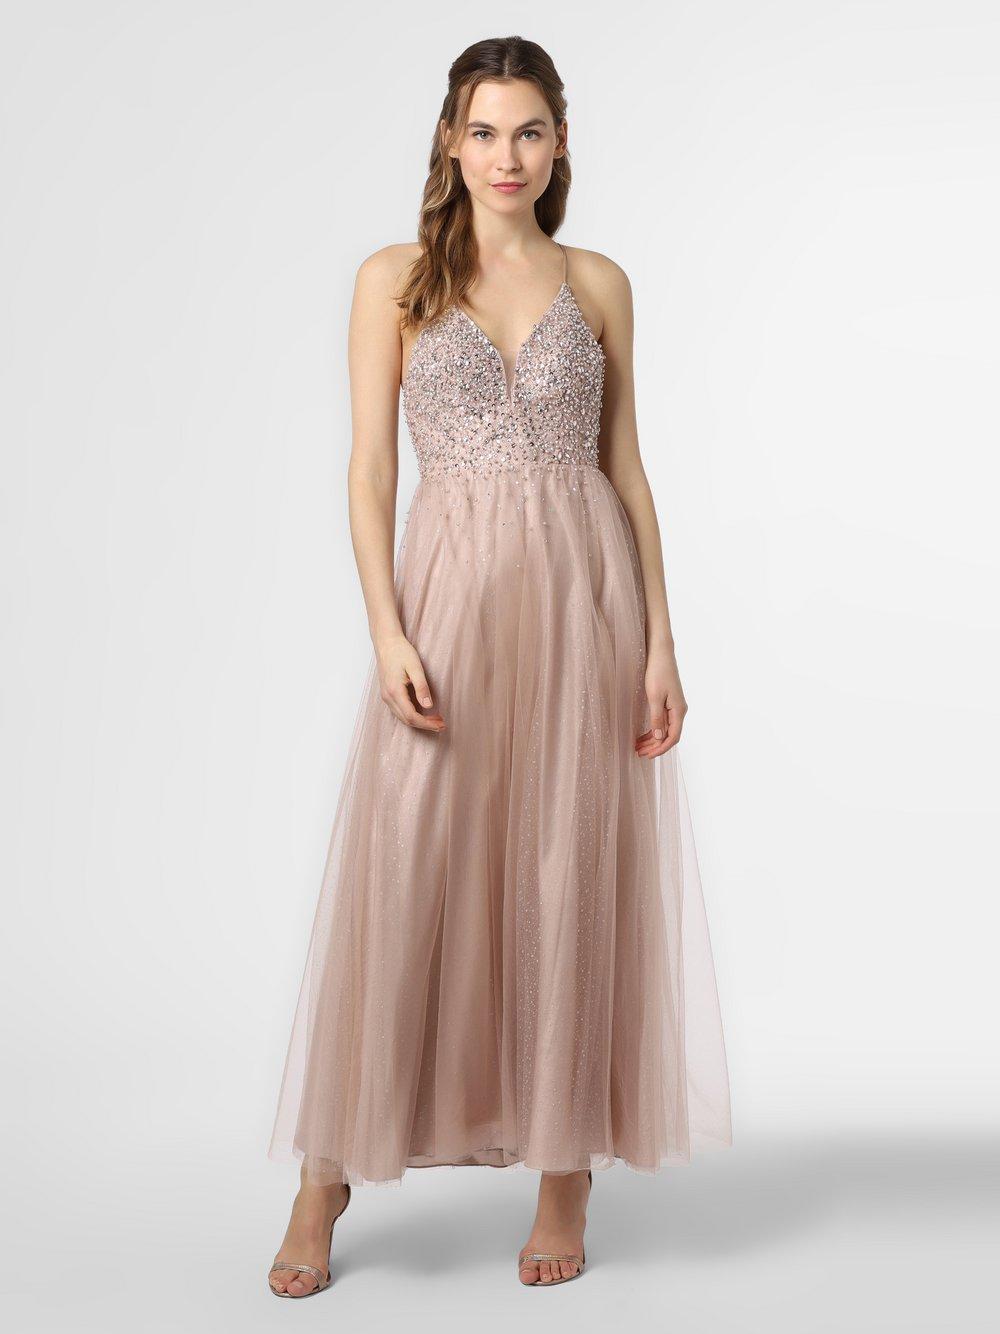 Laona – Damska sukienka wieczorowa, beżowy Van Graaf 472448-0002-00400